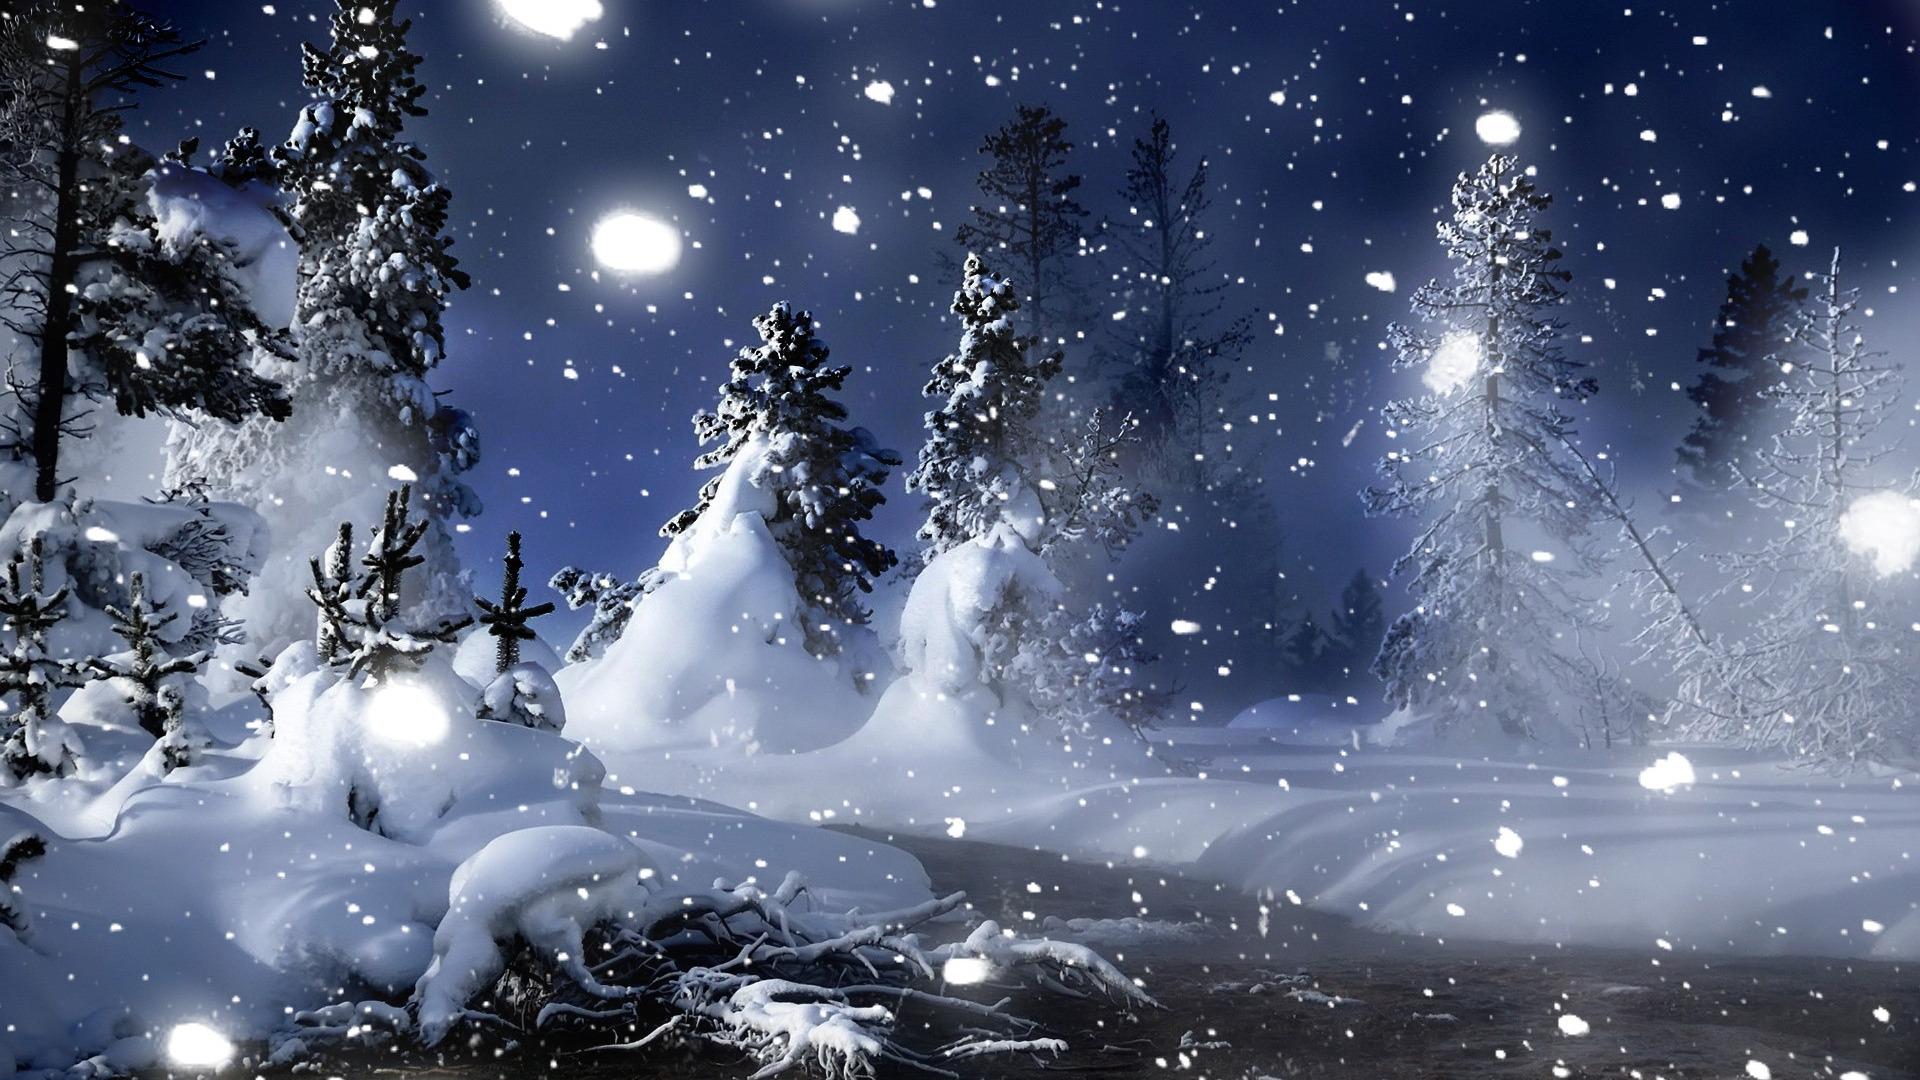 76] Winter Background Wallpaper on WallpaperSafari 1920x1080